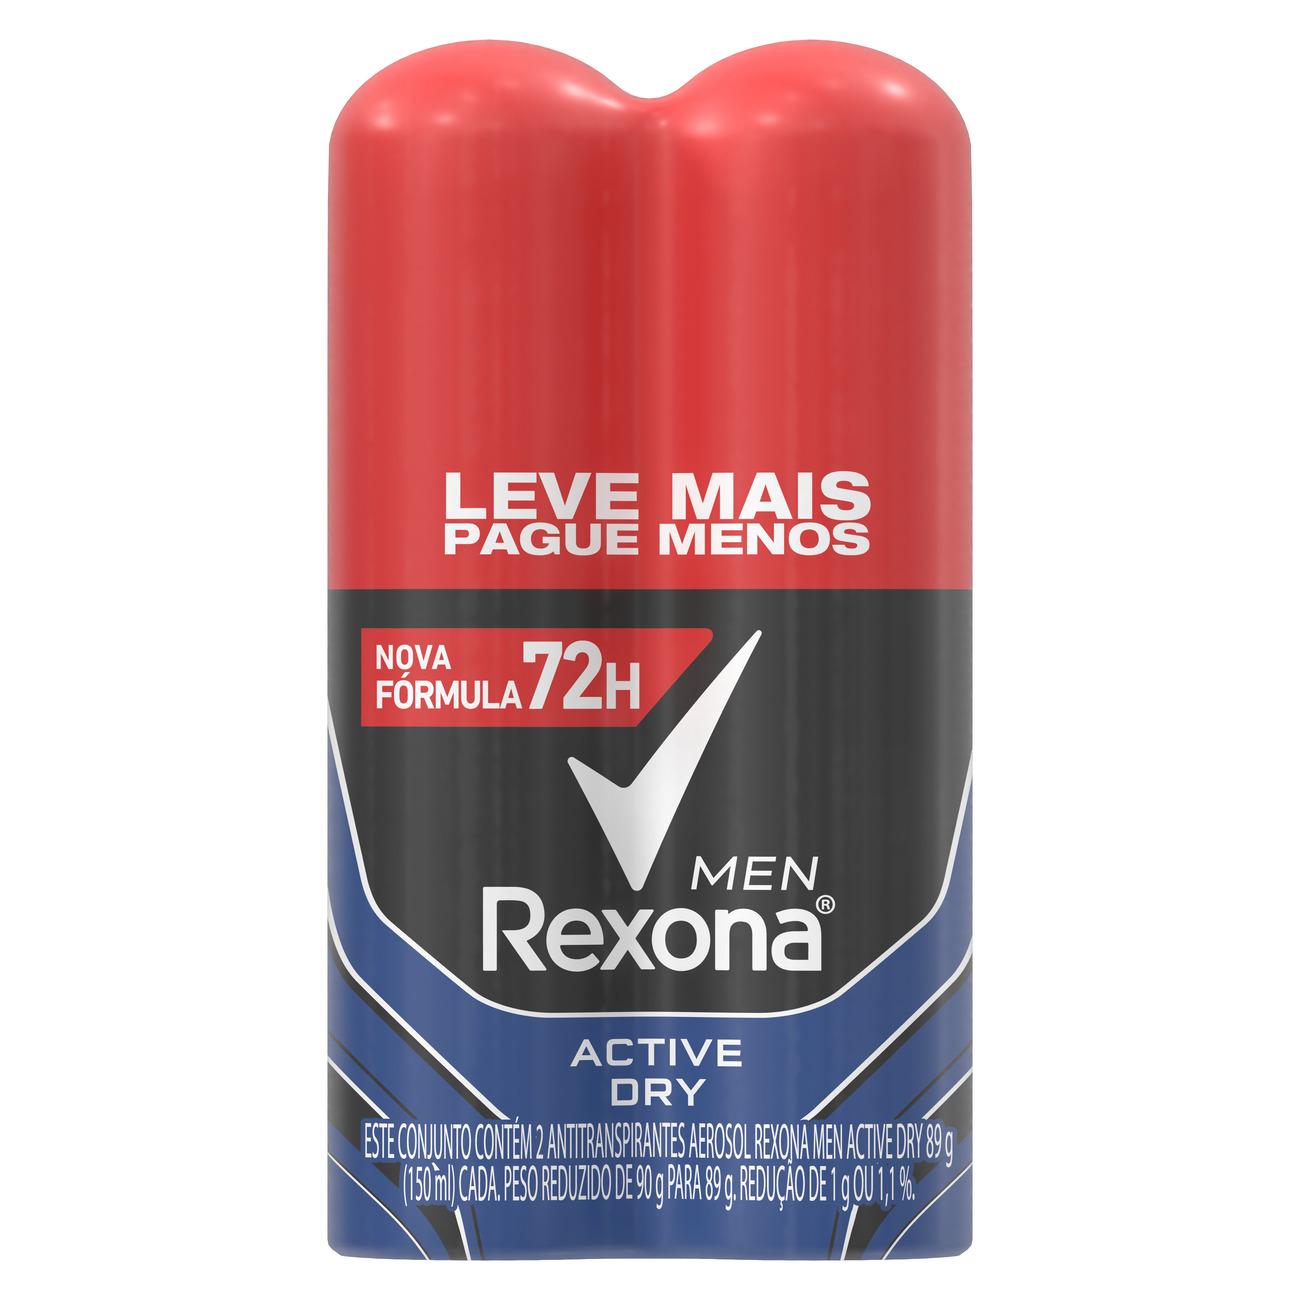 Oferta 2 Desodorantes Antitranspirante Rexona Men Aerosol Active Dry 72 horas 150mL